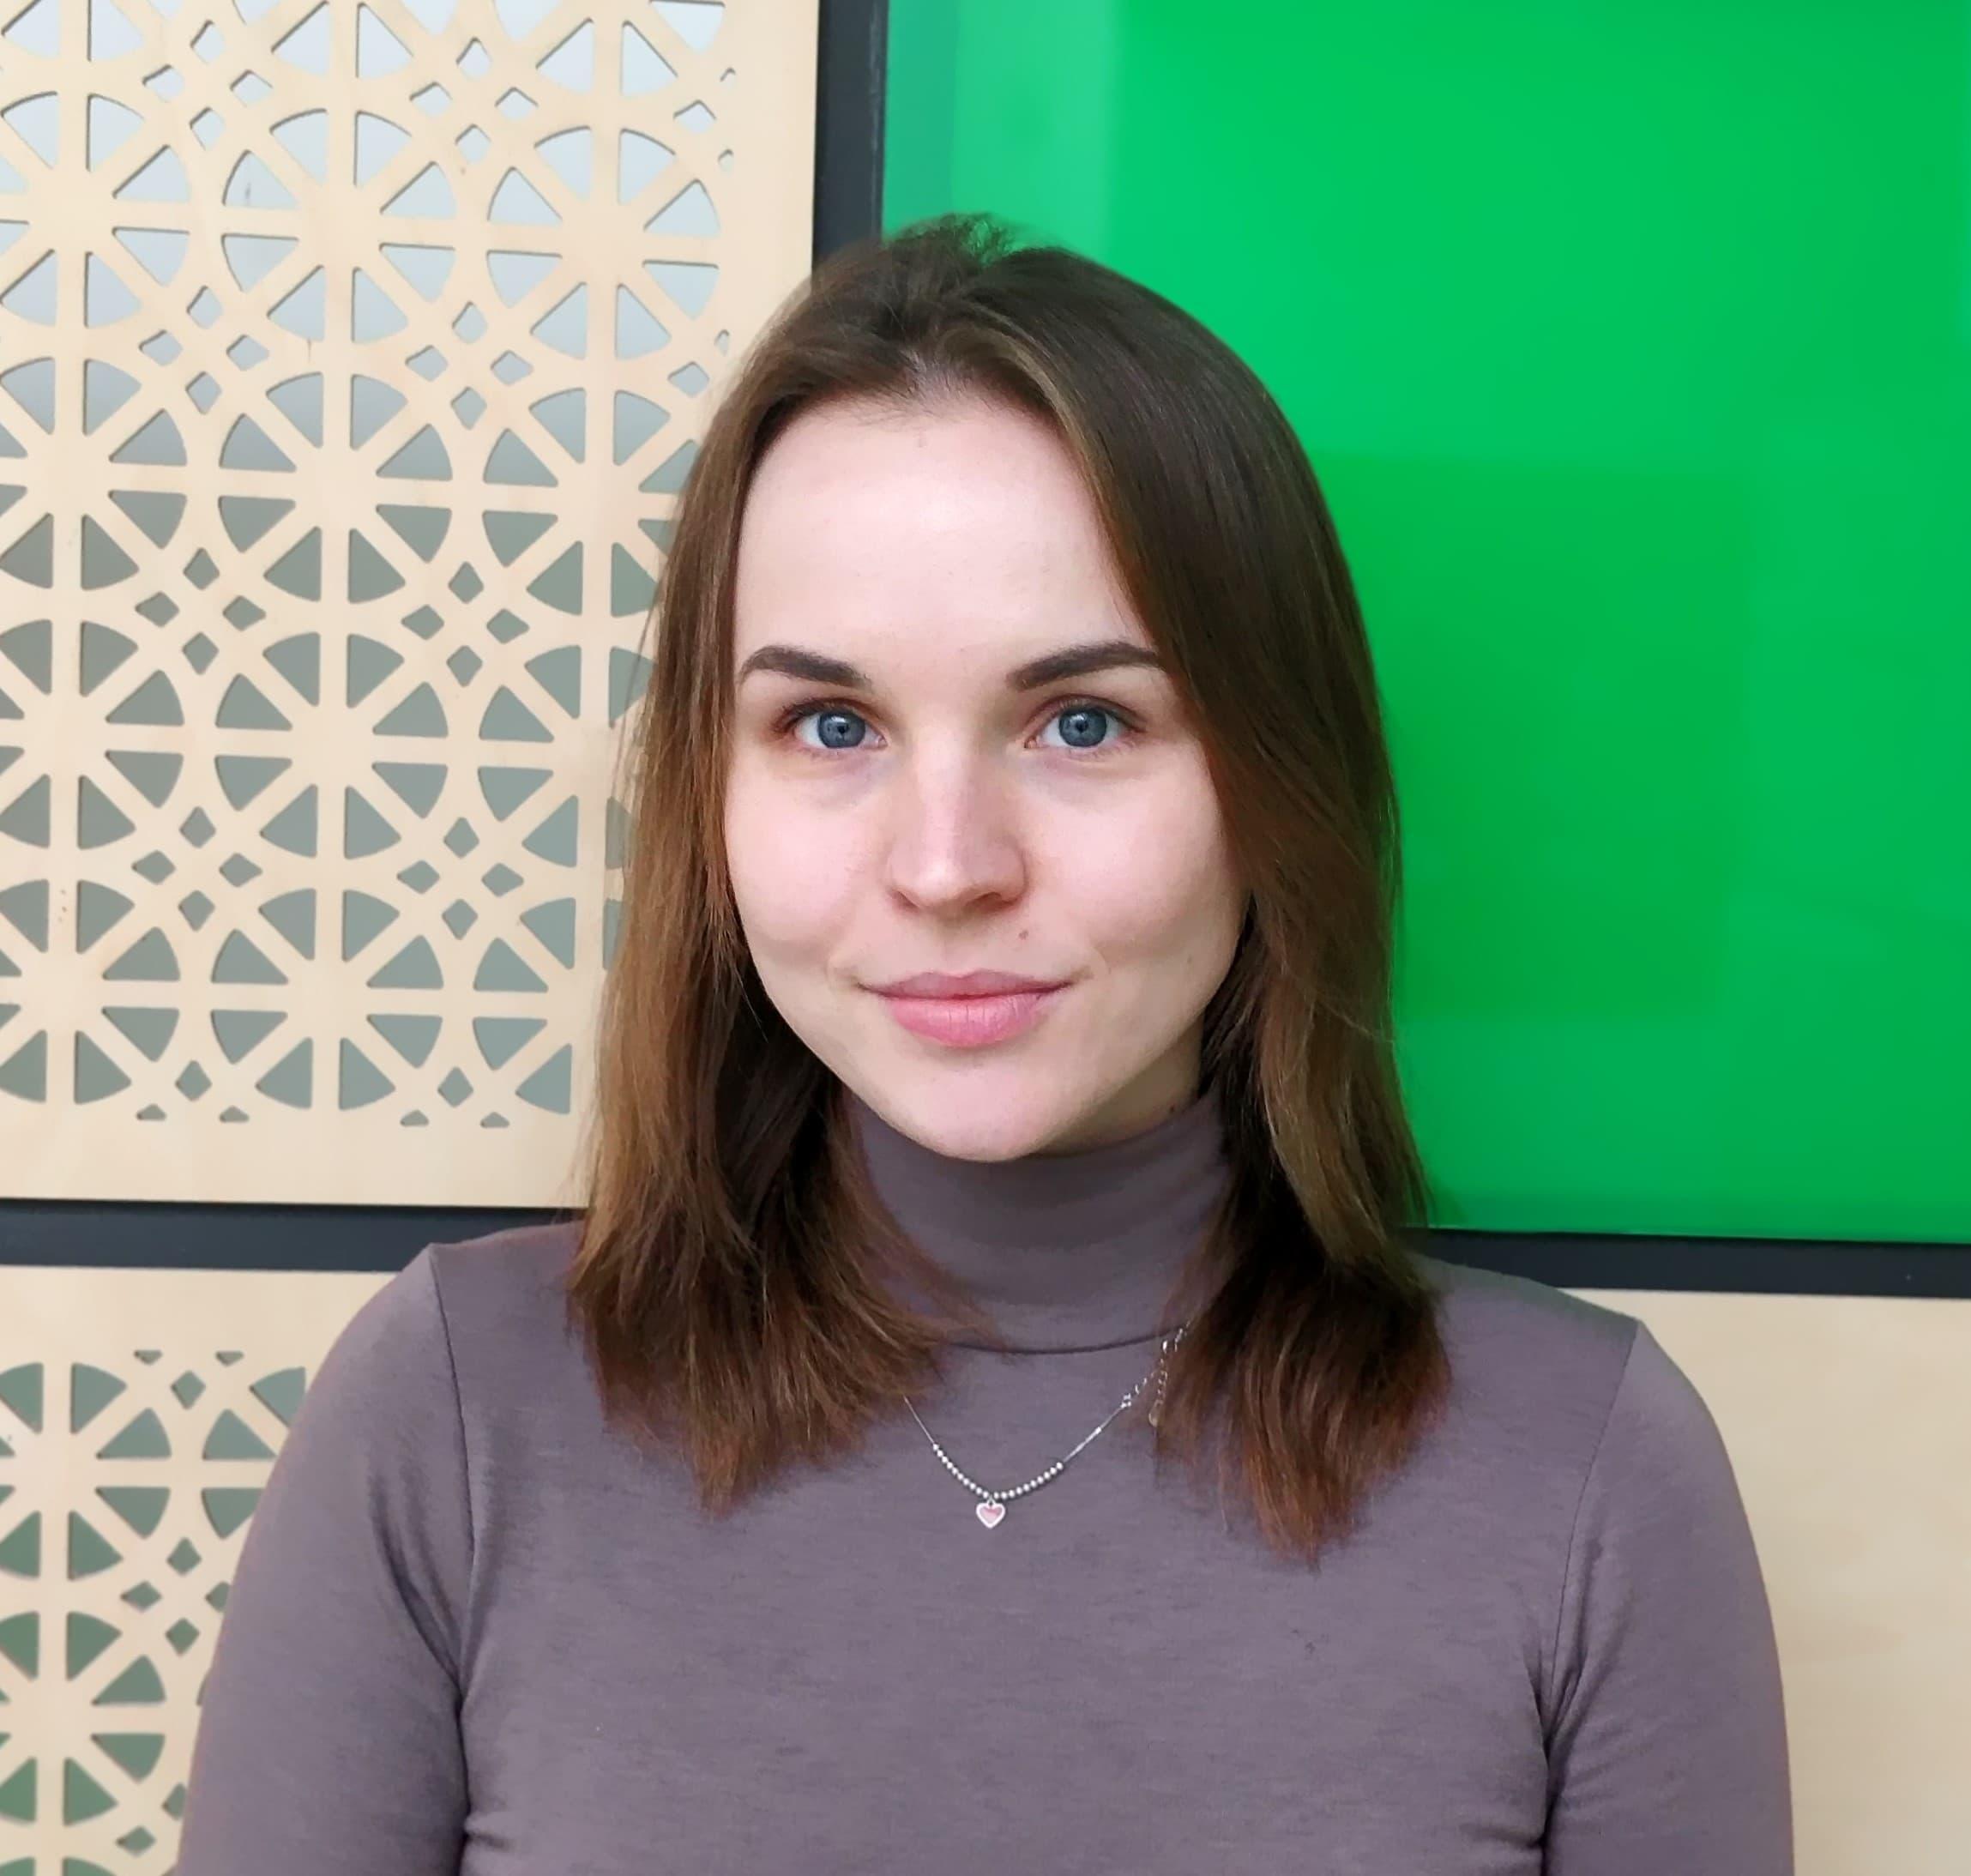 Christina Lesnianska